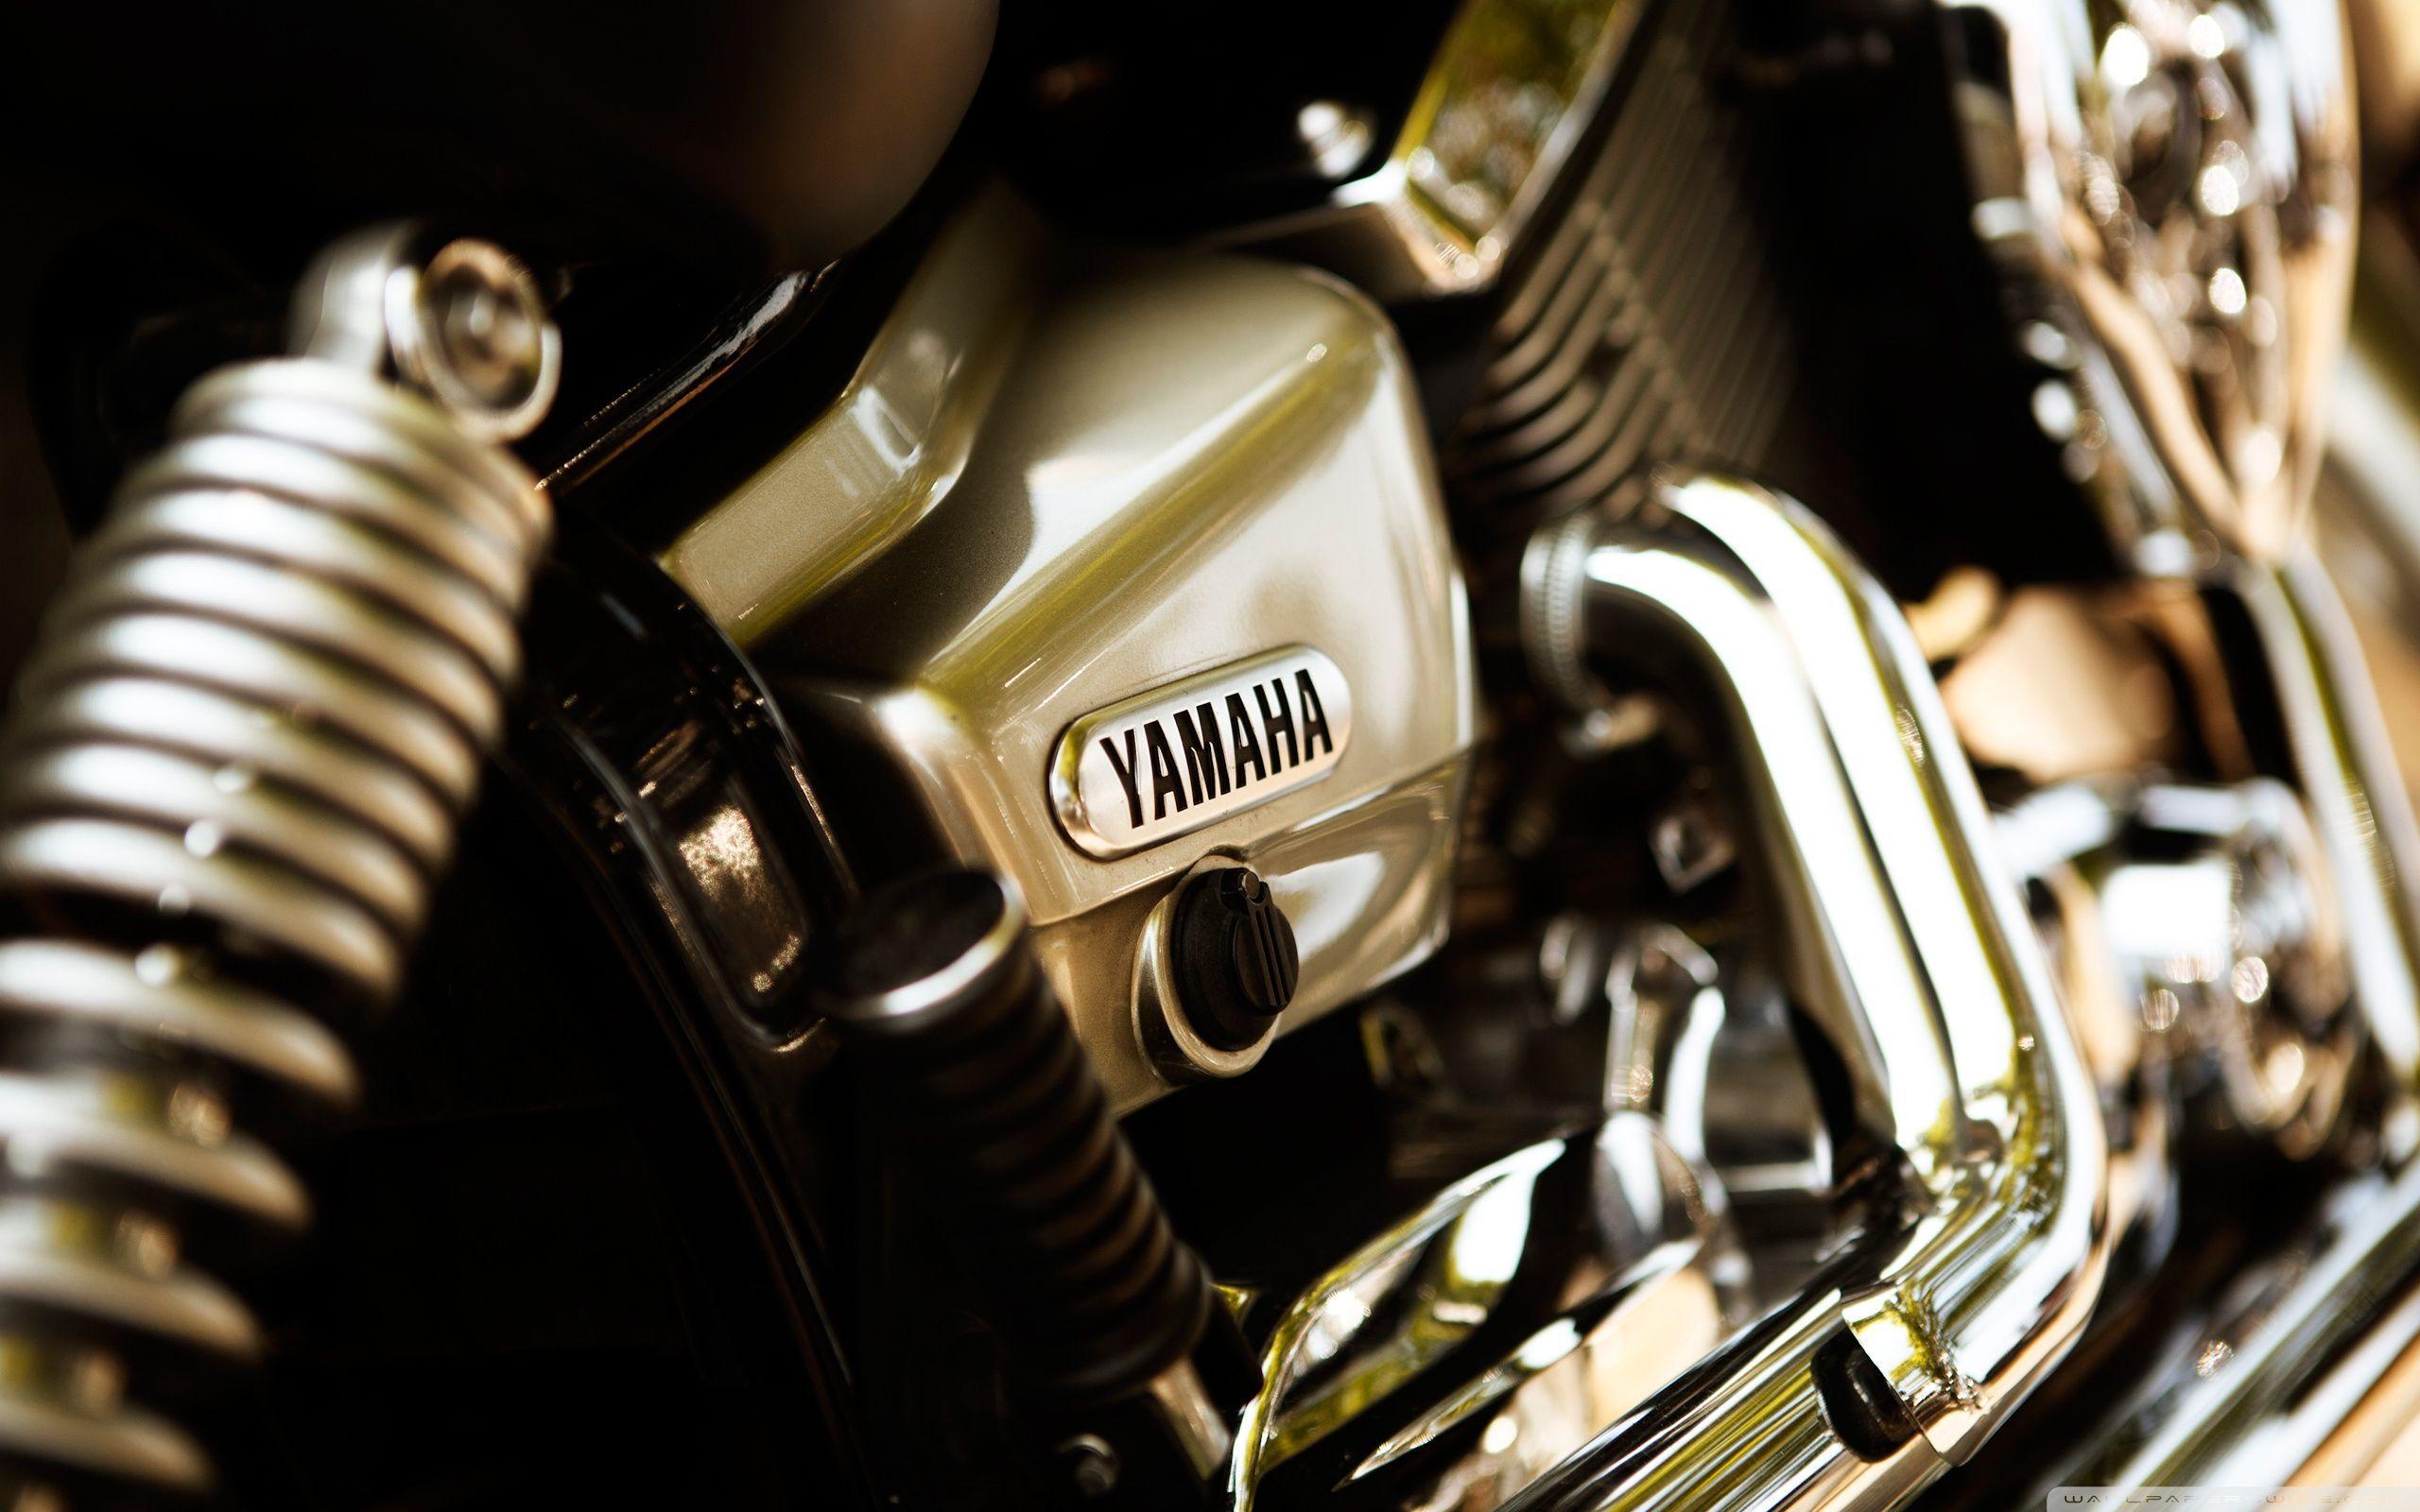 Top Free Yamaha Backgrounds